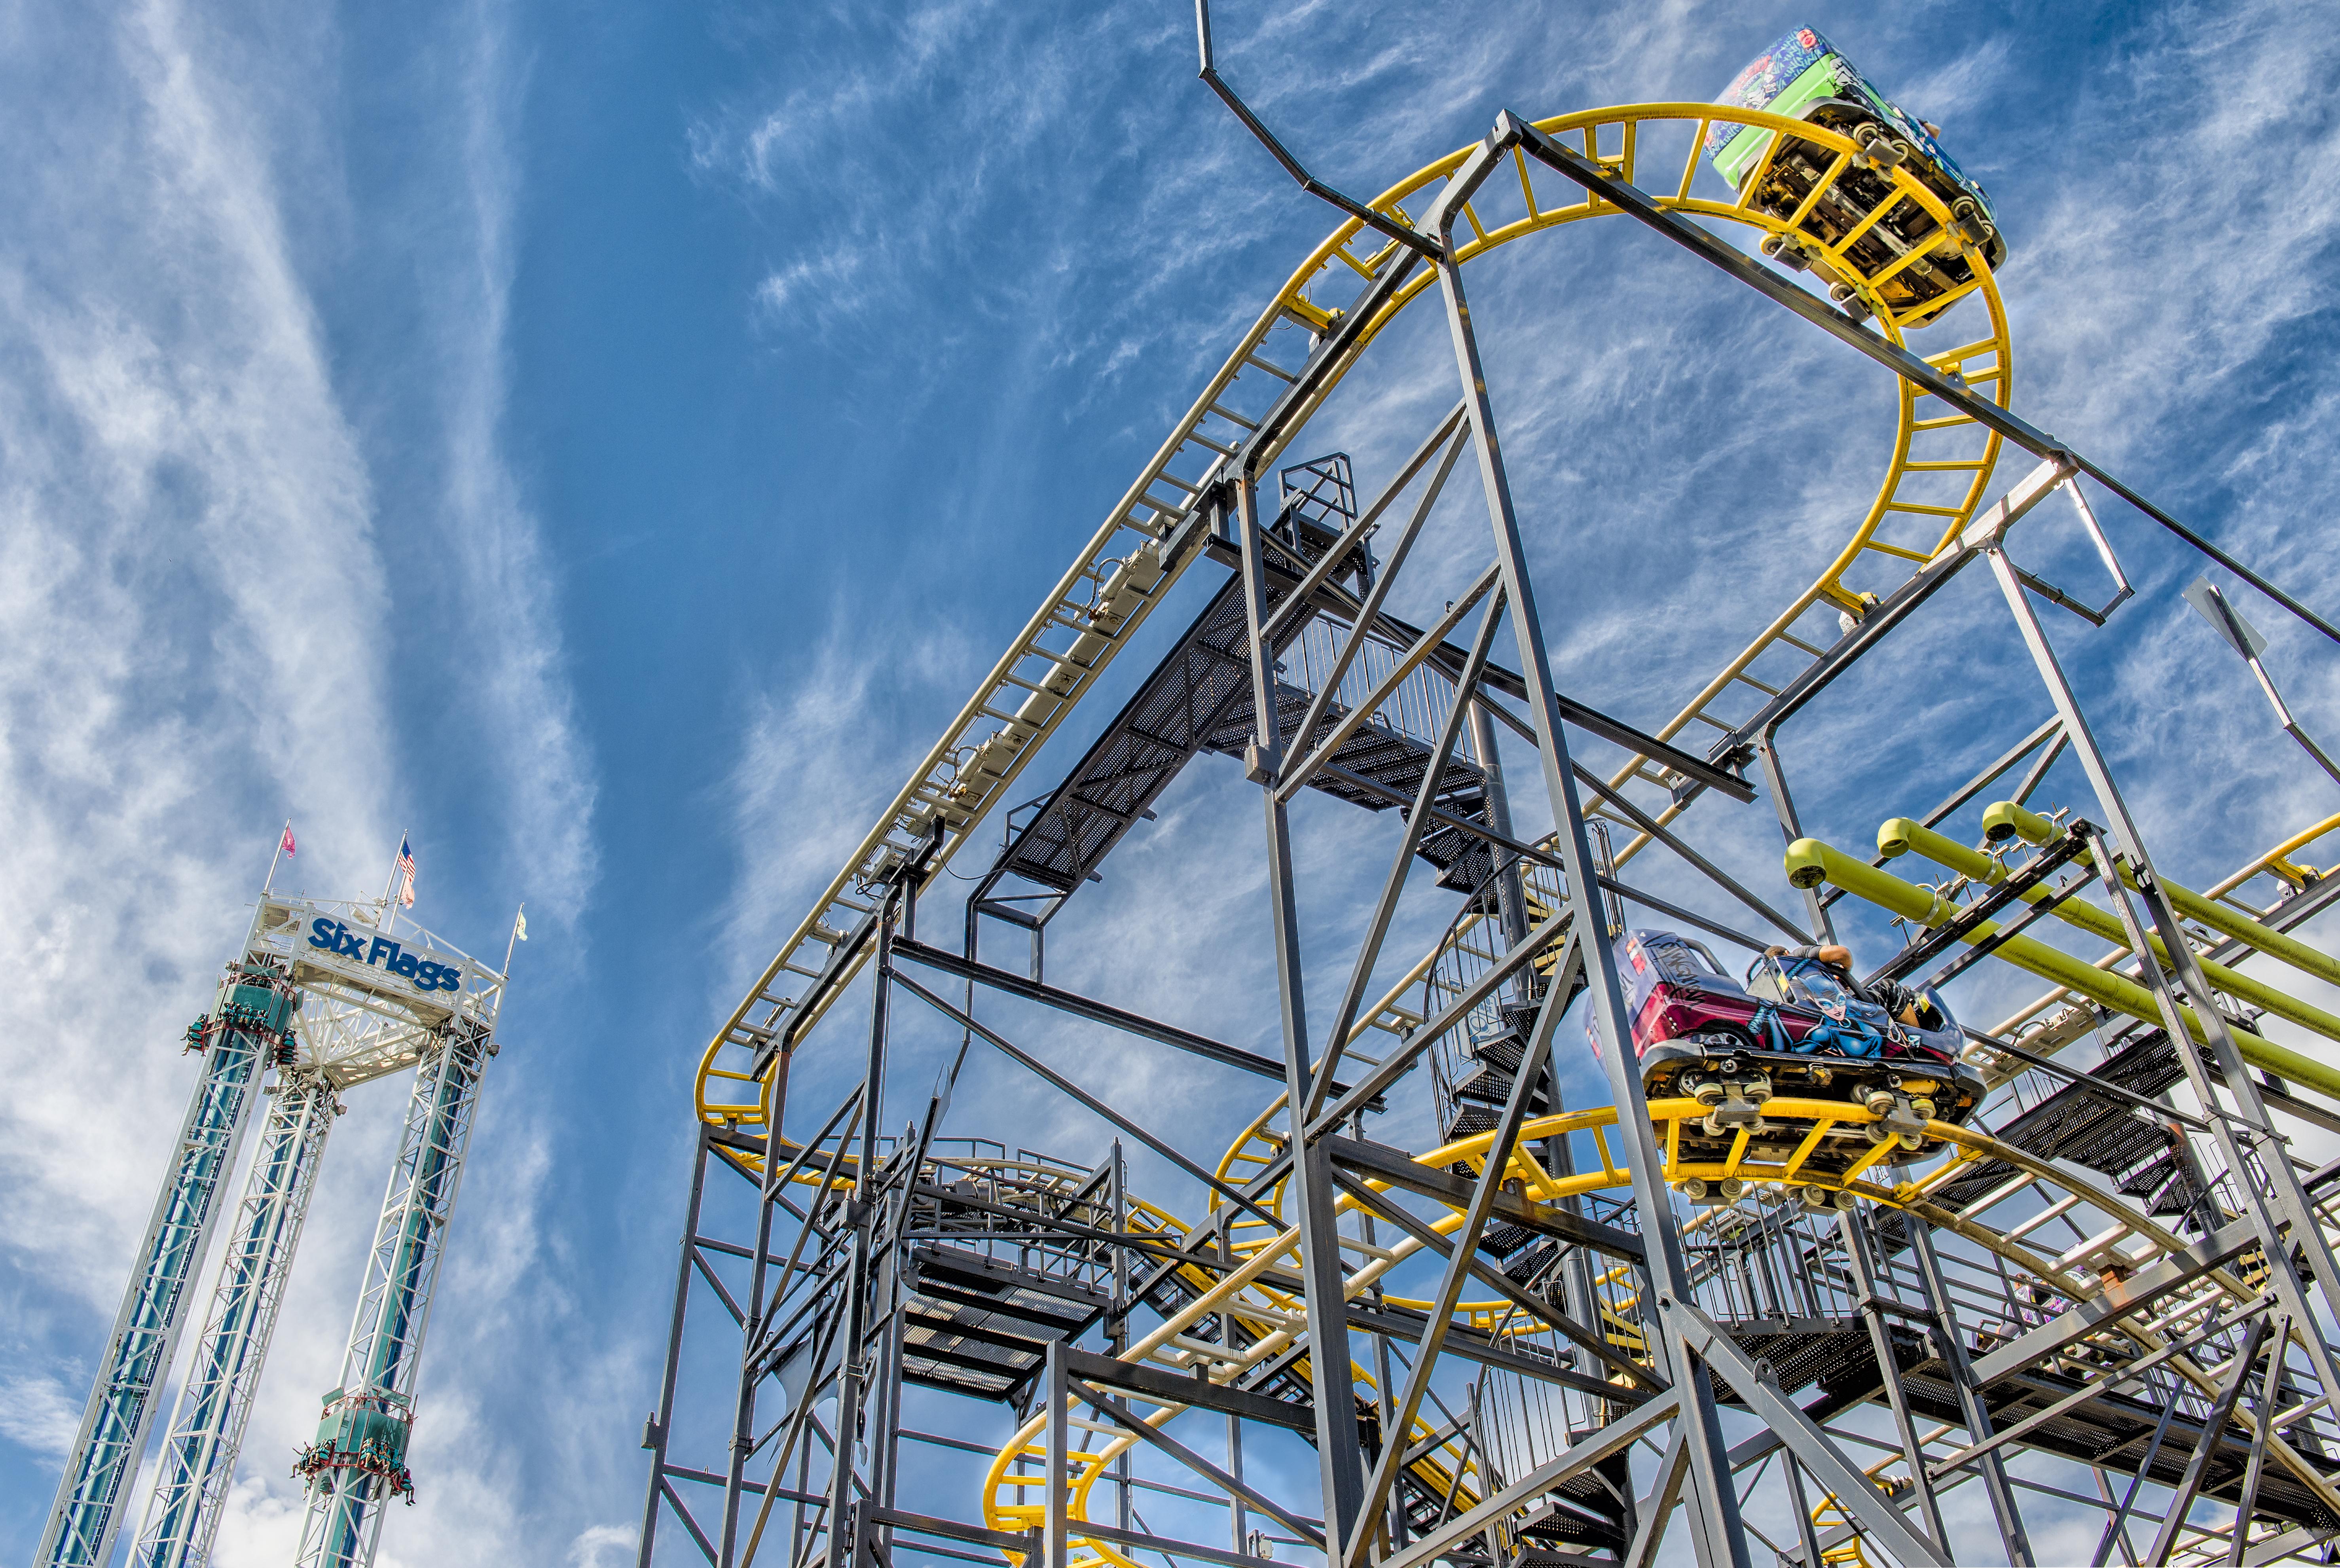 Gotham City Gauntlet - Six Flags New England